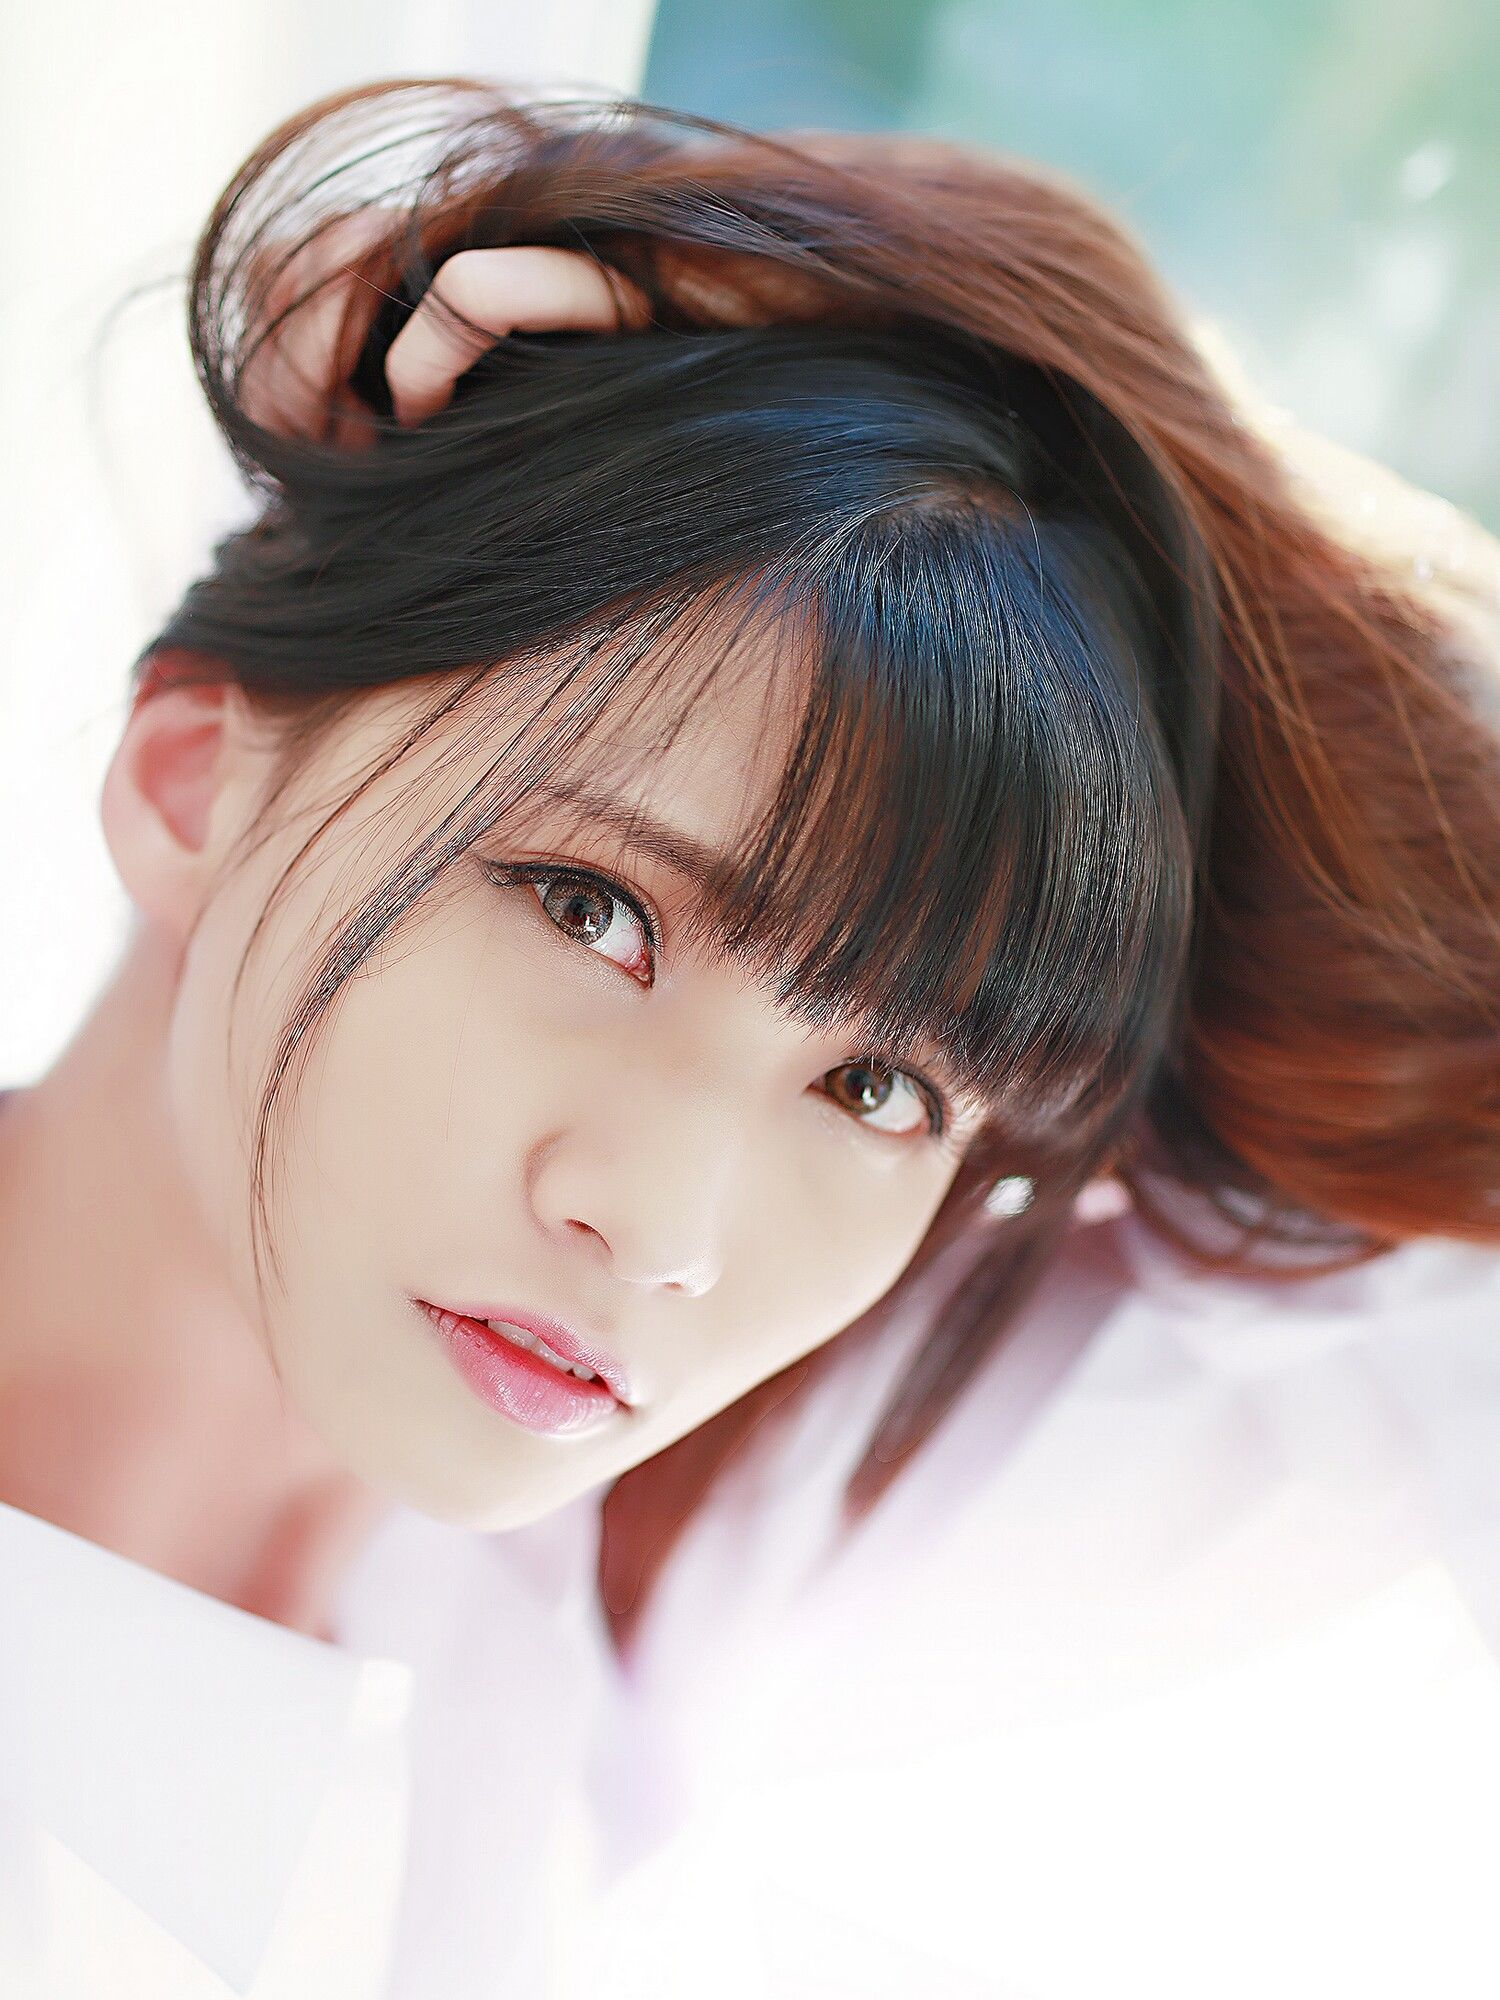 VOL.793 [台湾正妹]清纯妹子:蔡译心(Candice)超高清个人性感漂亮大图(68P)